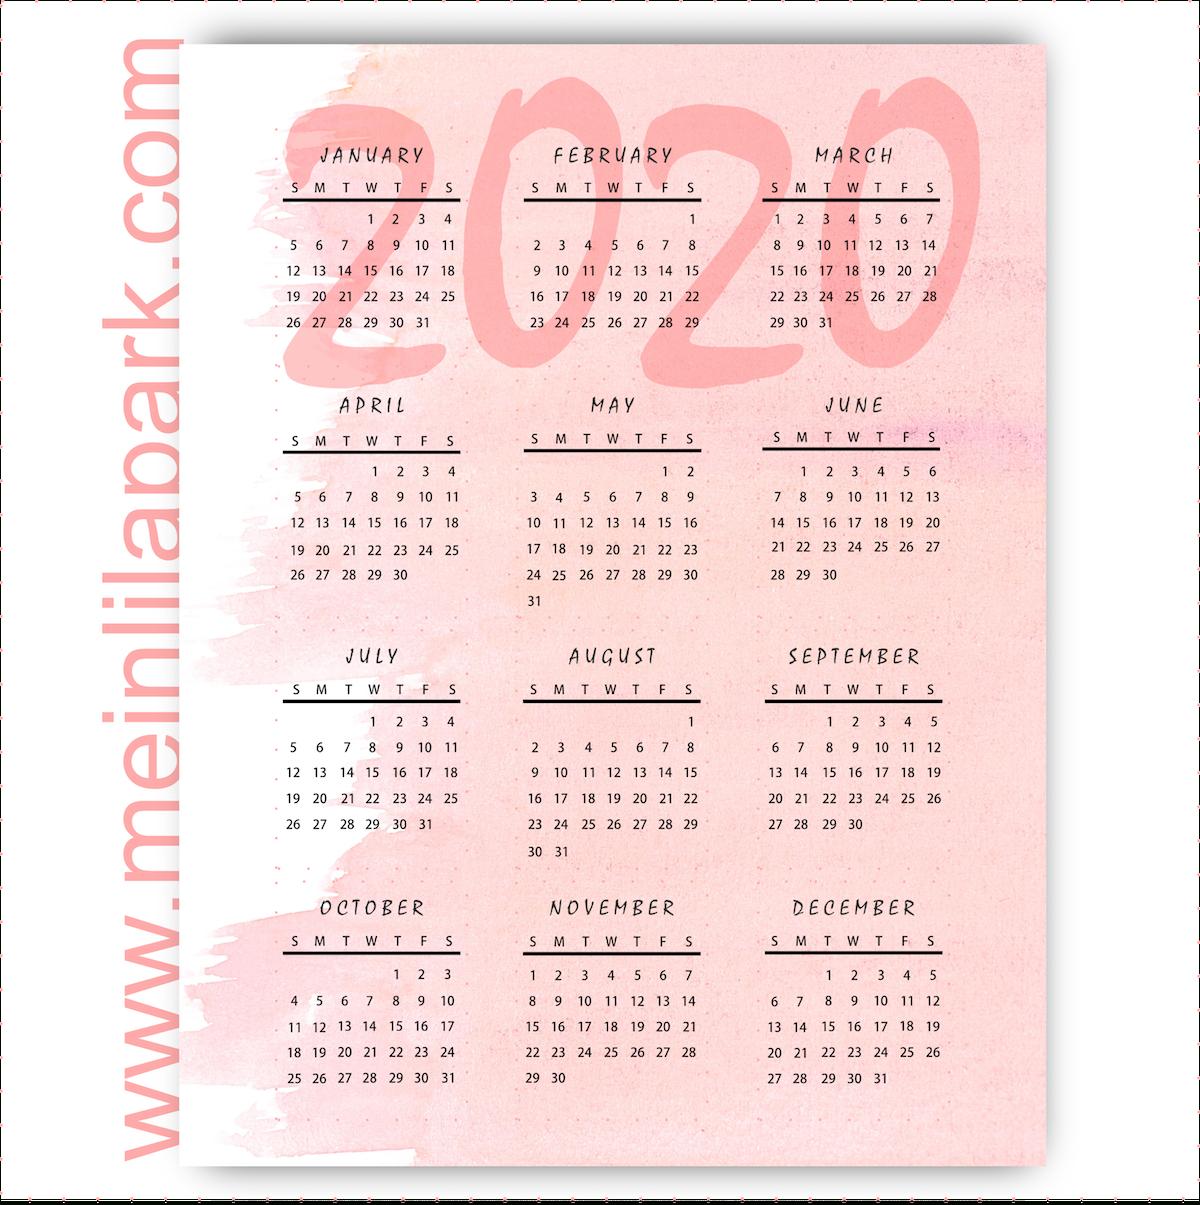 Meinlilapark: Thinking Ahead: Printable 2020 Calendar In